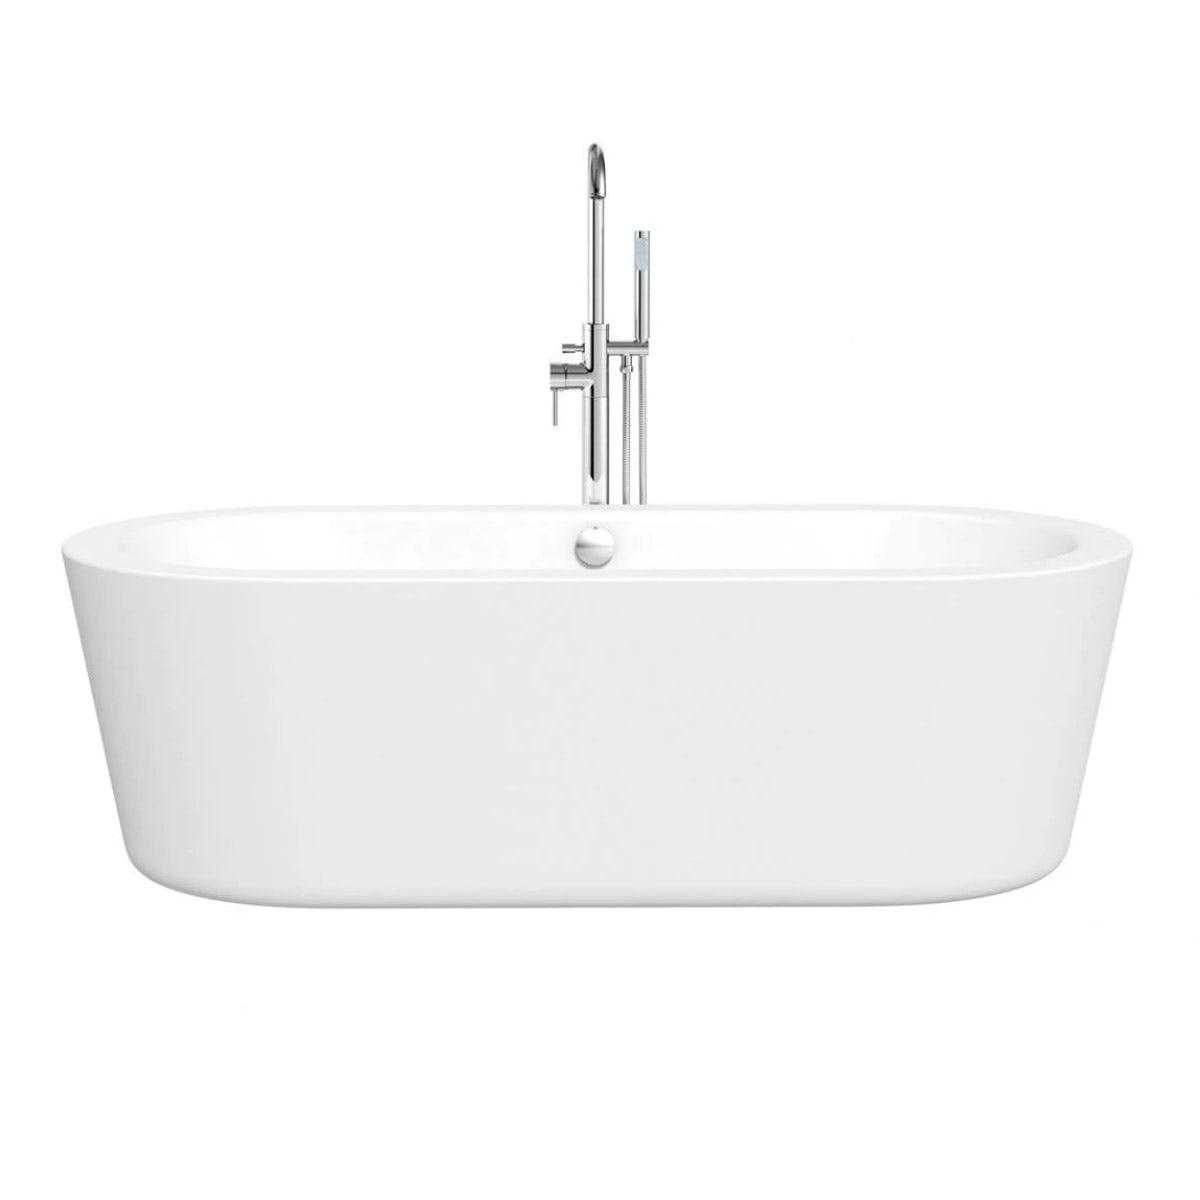 crescent bath